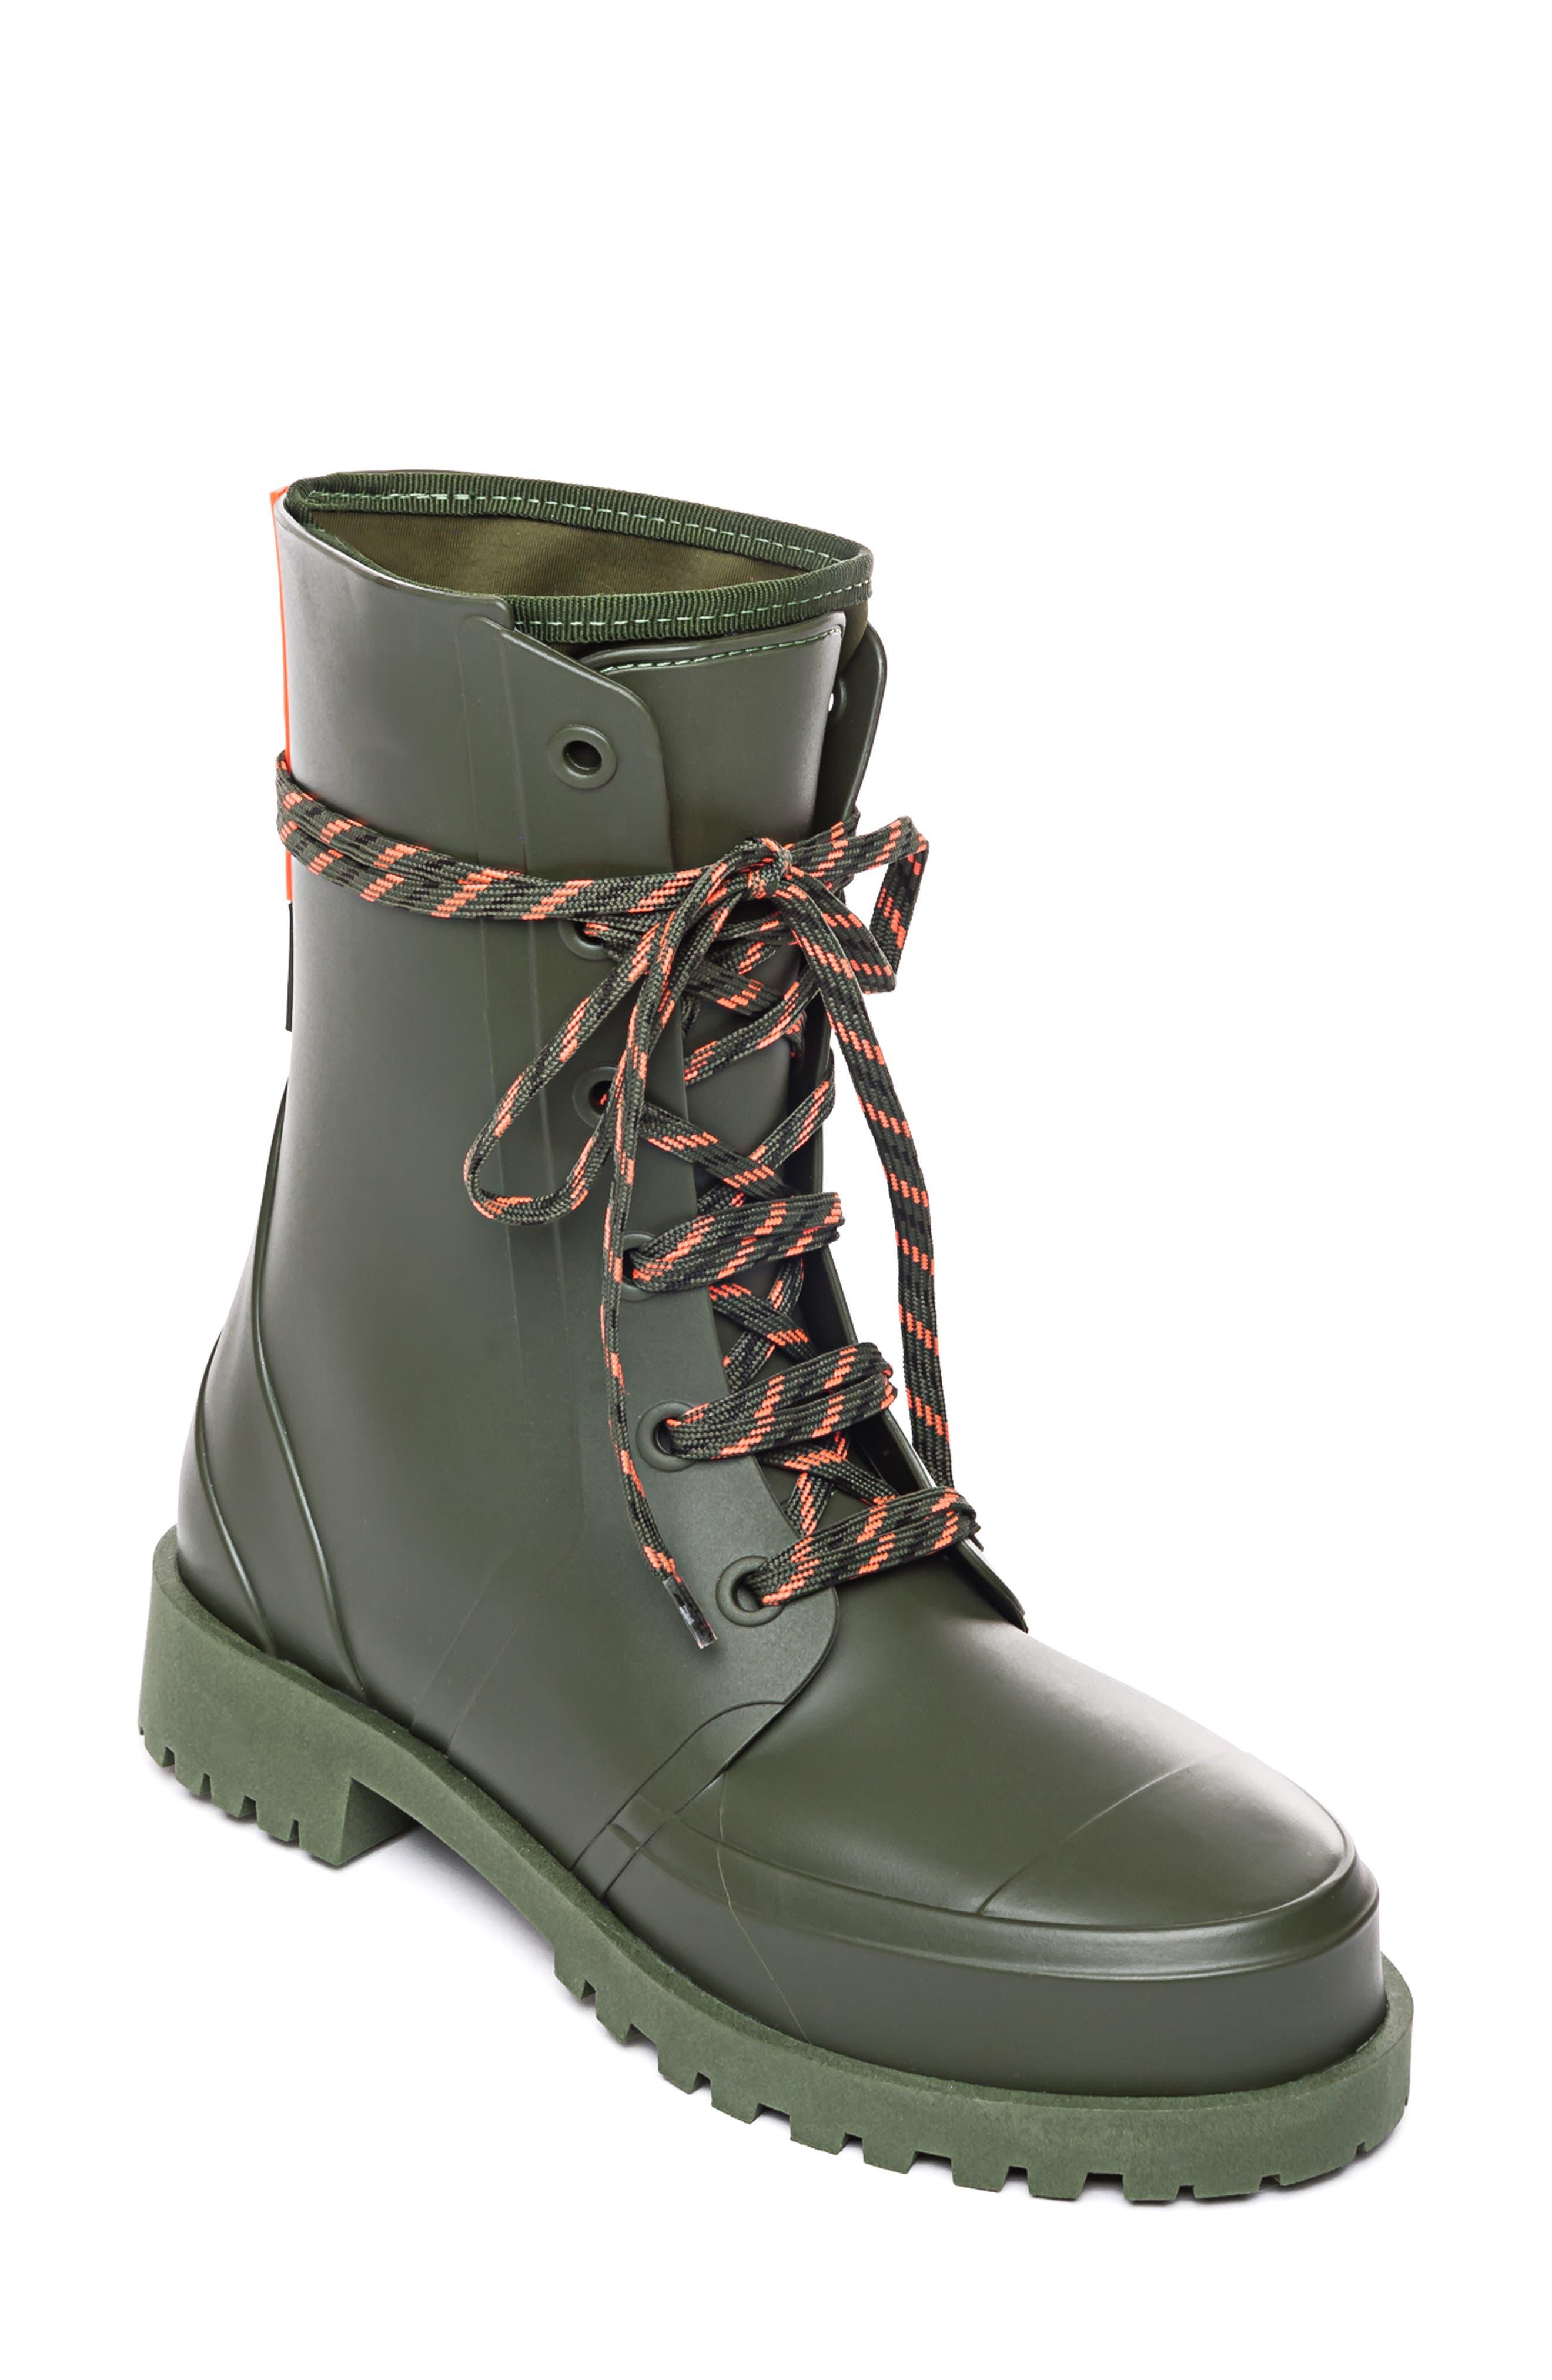 Footwear Andra Waterproof Rain Boot